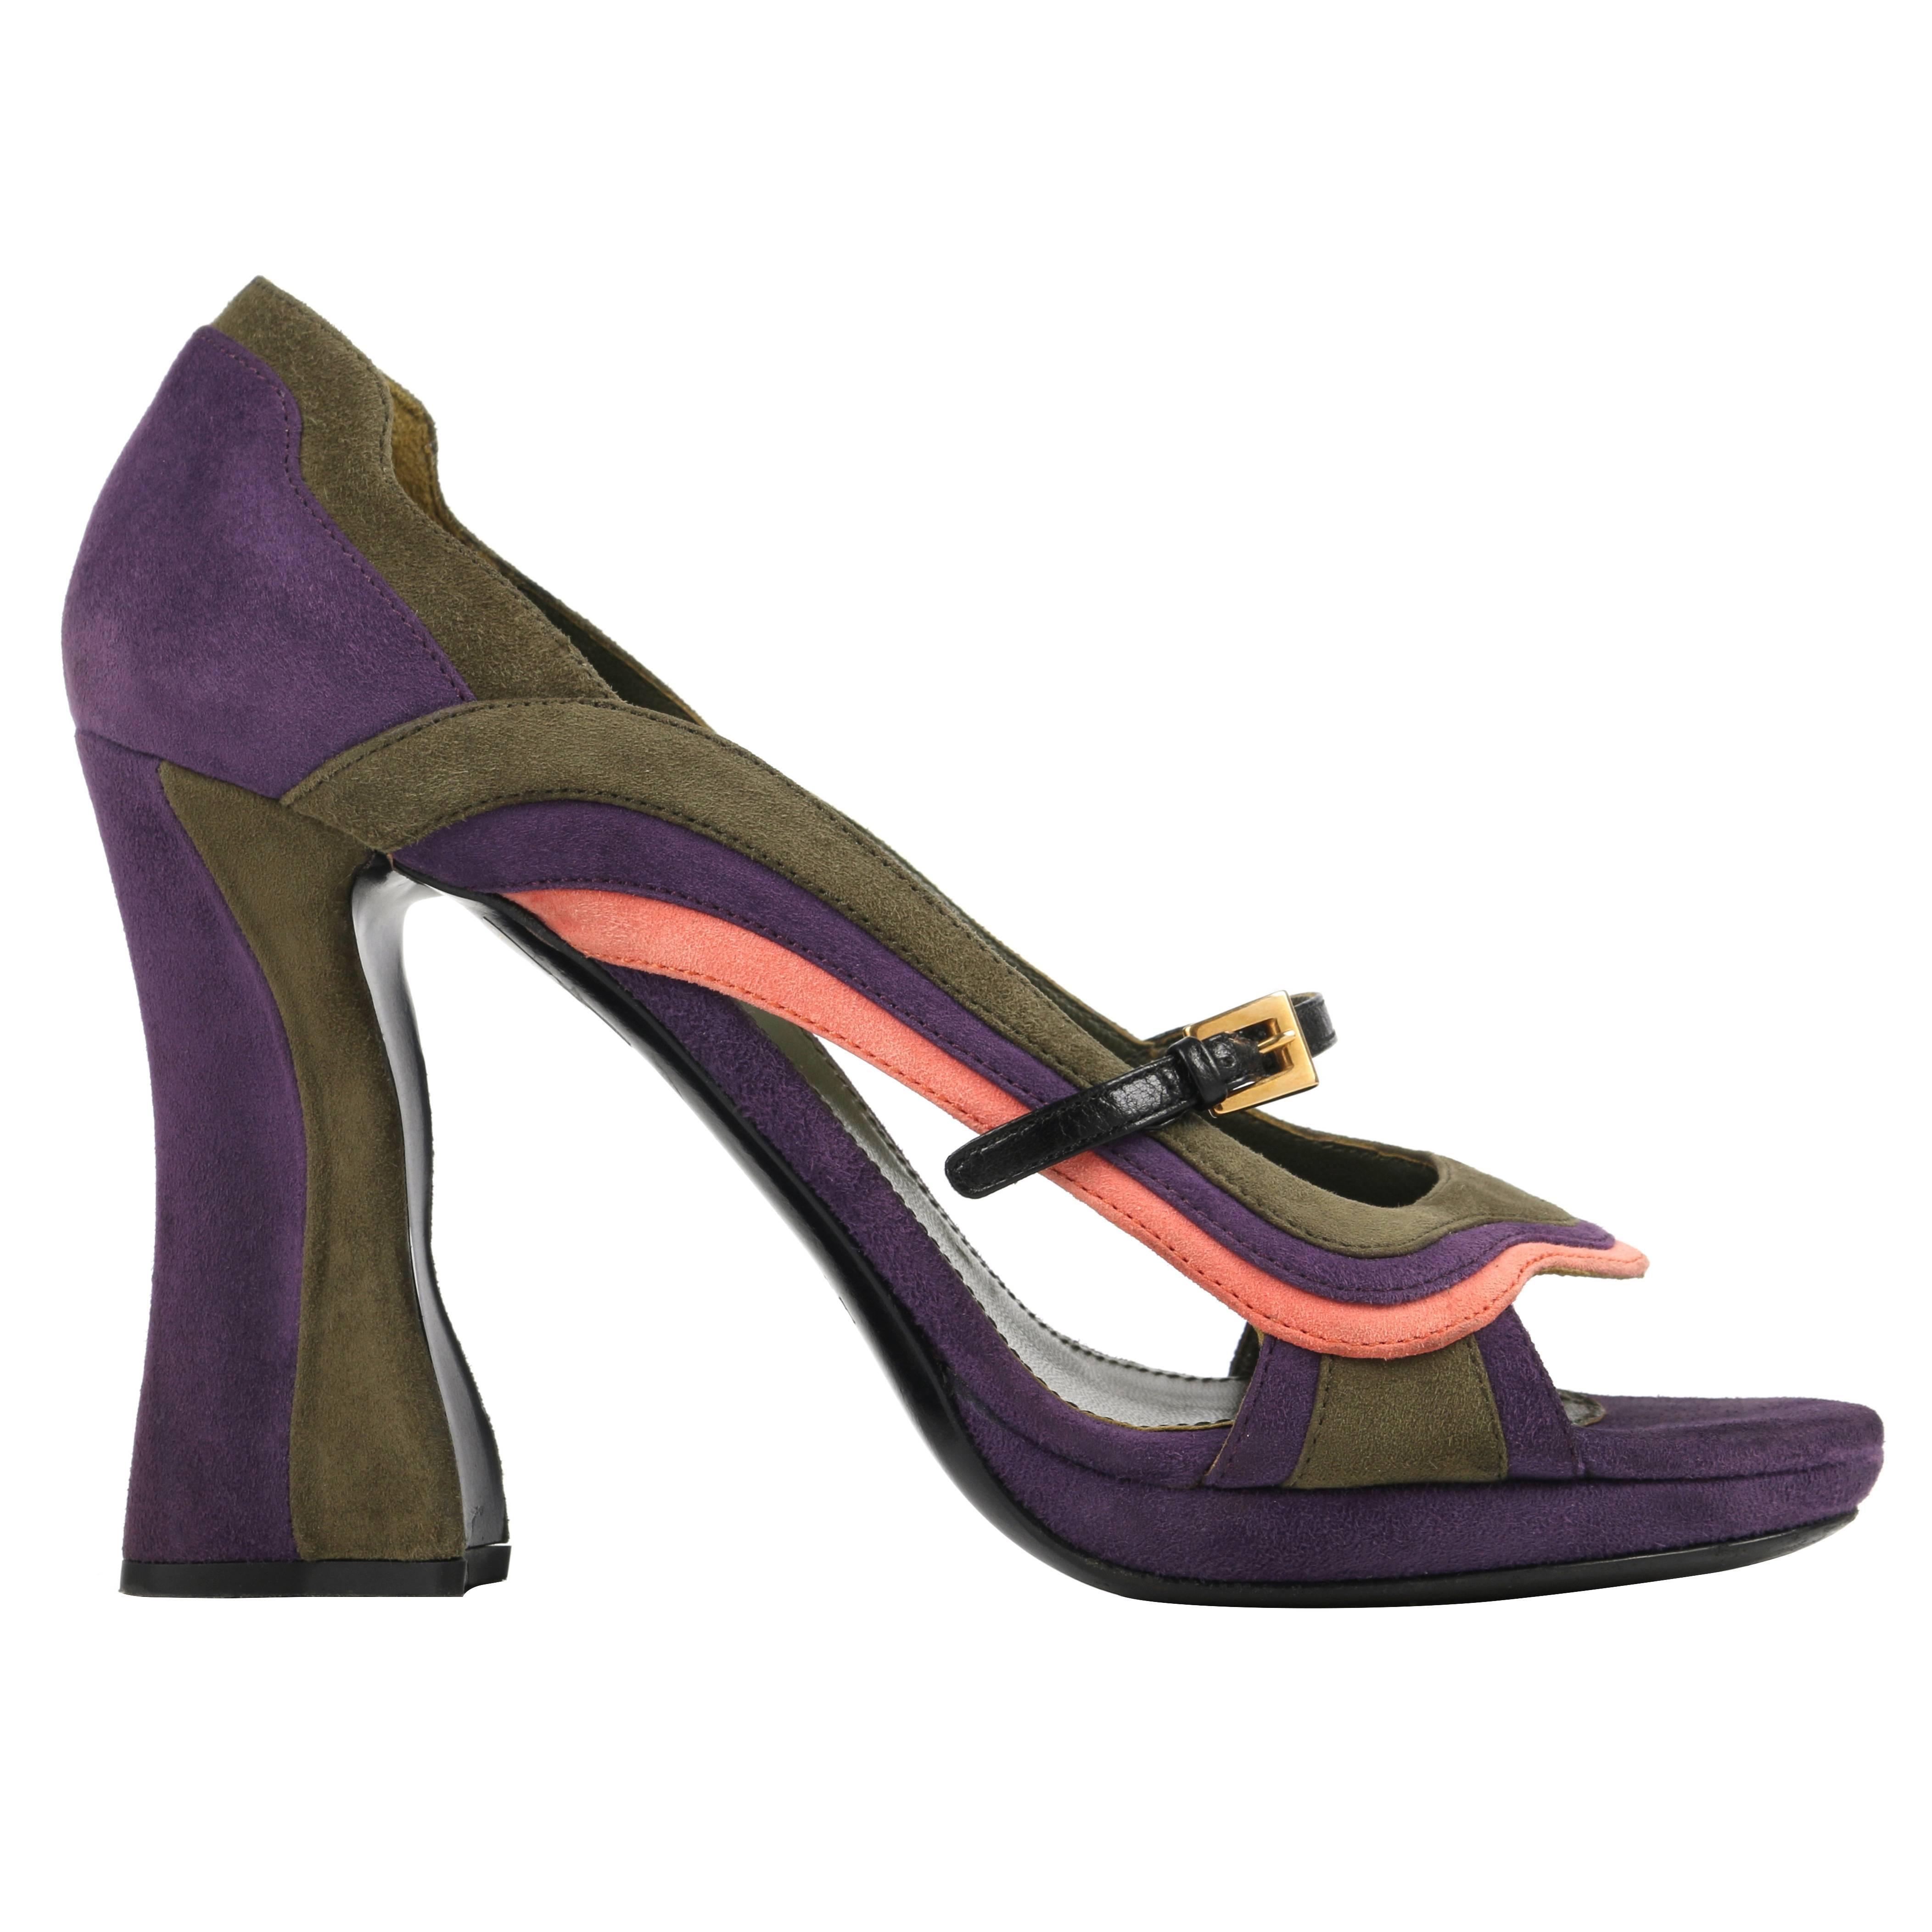 "PRADA Fairy Collection S/S 2008 ""Wave"" Color-Block Suede Pumps Heels Shoes"